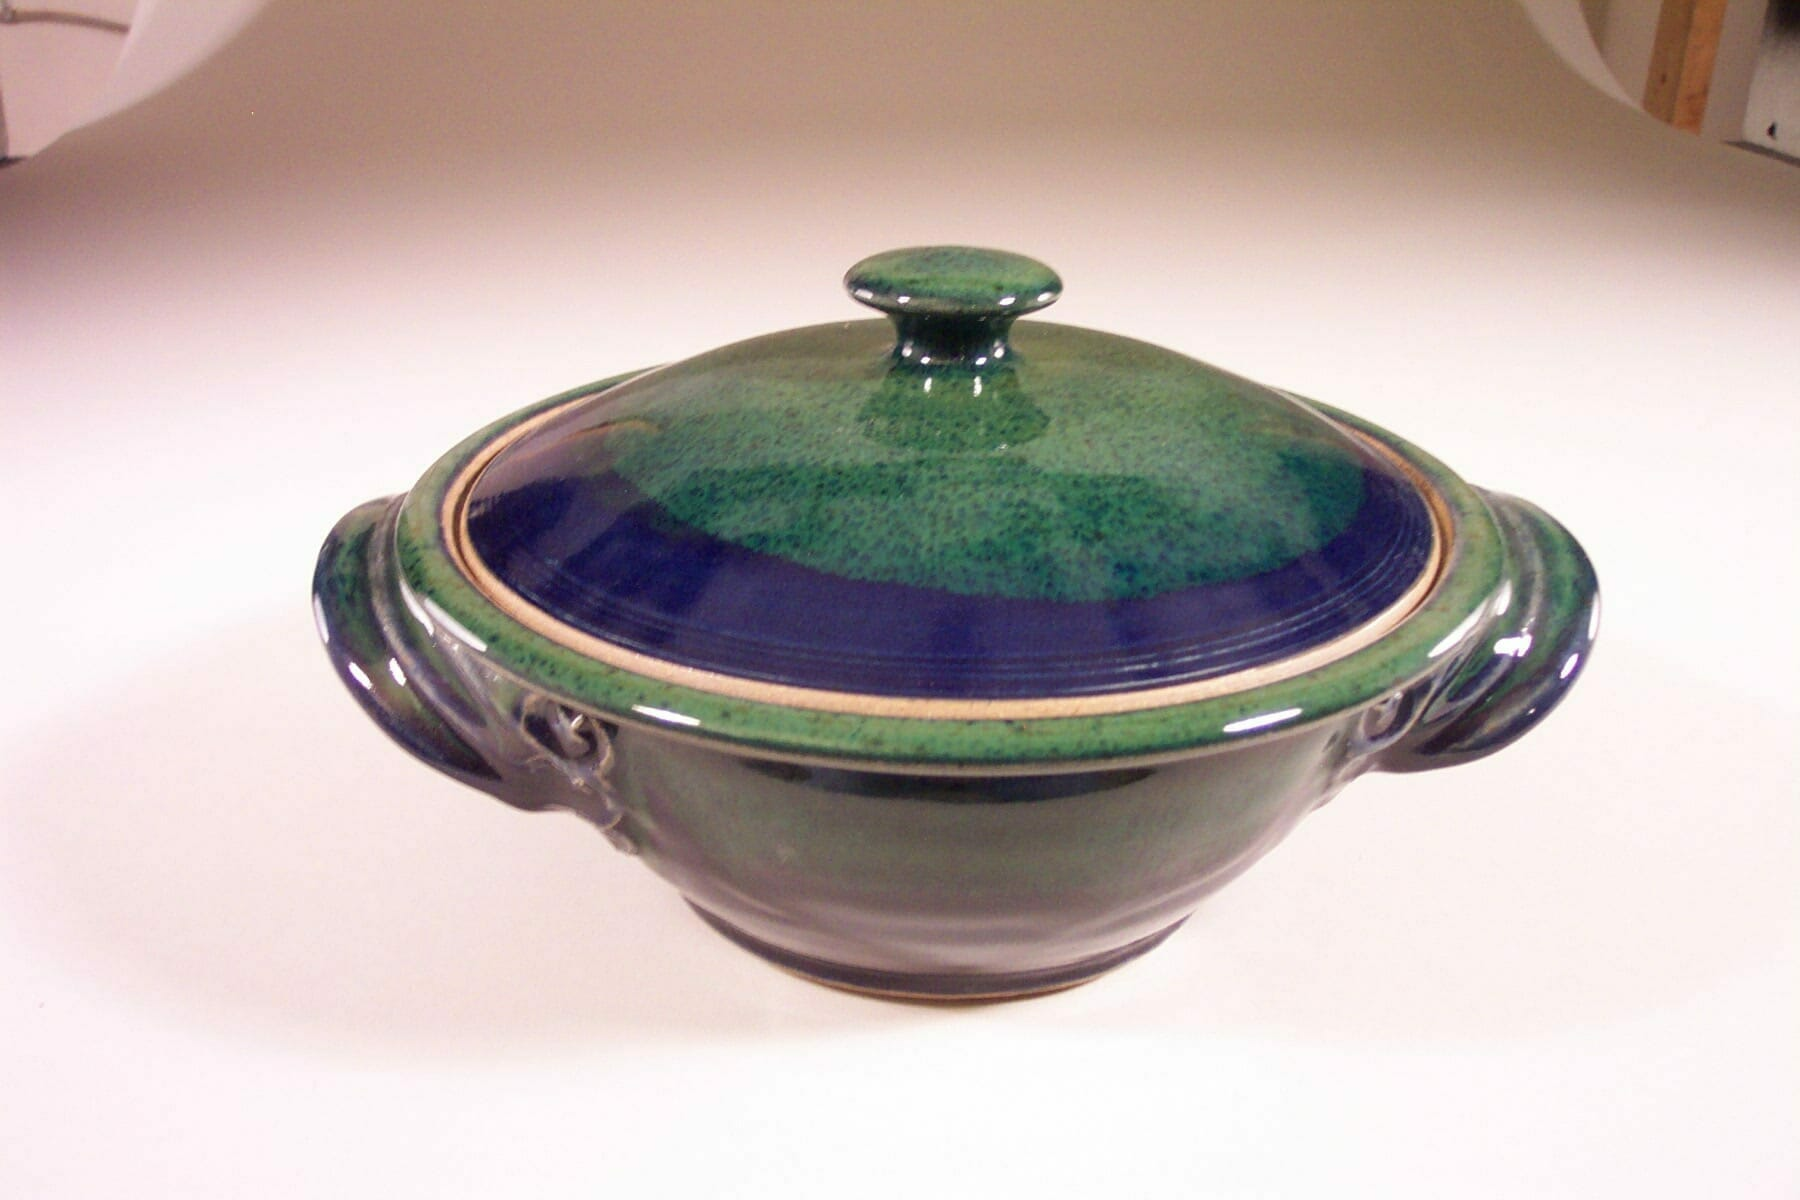 Medium Casserole with Lid Smooth Design in Dark Blue and Green  Glaze